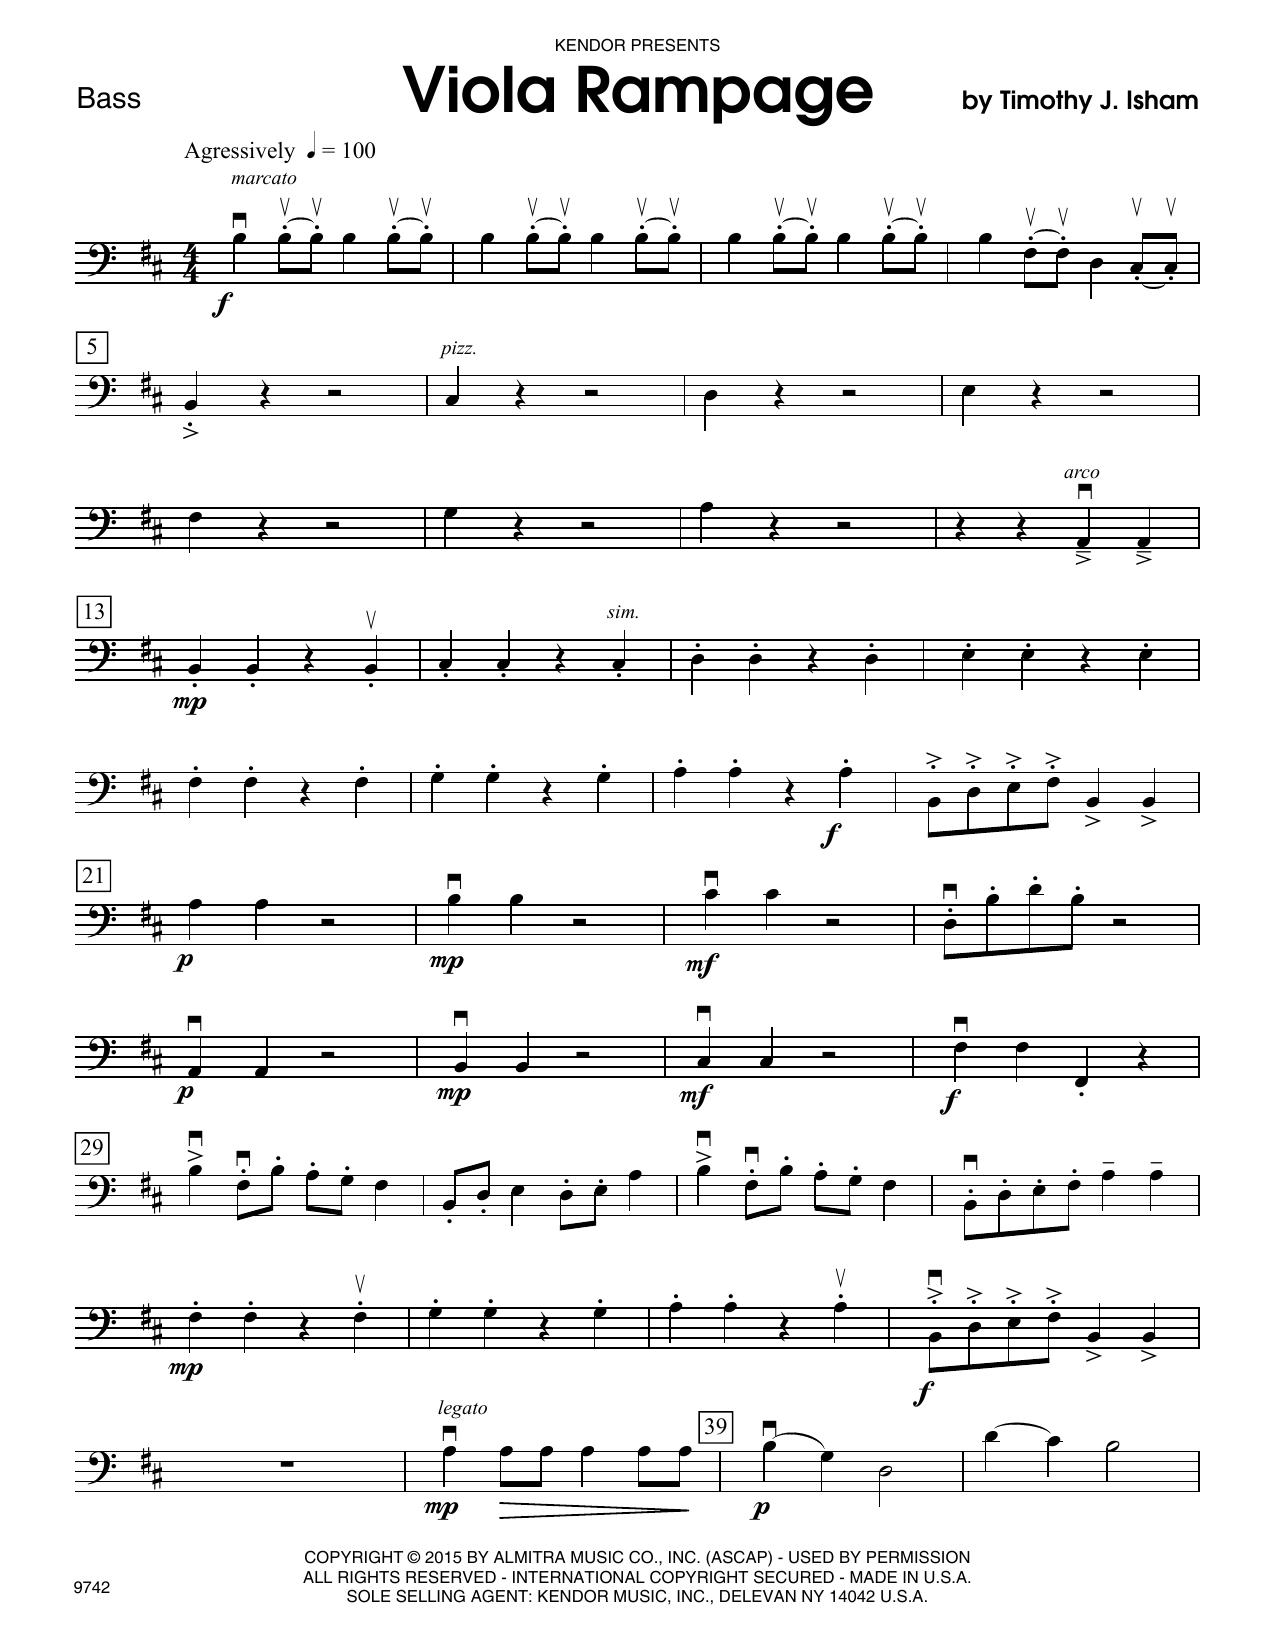 Timothy Isham Viola Rampage - Bass sheet music notes and chords. Download Printable PDF.